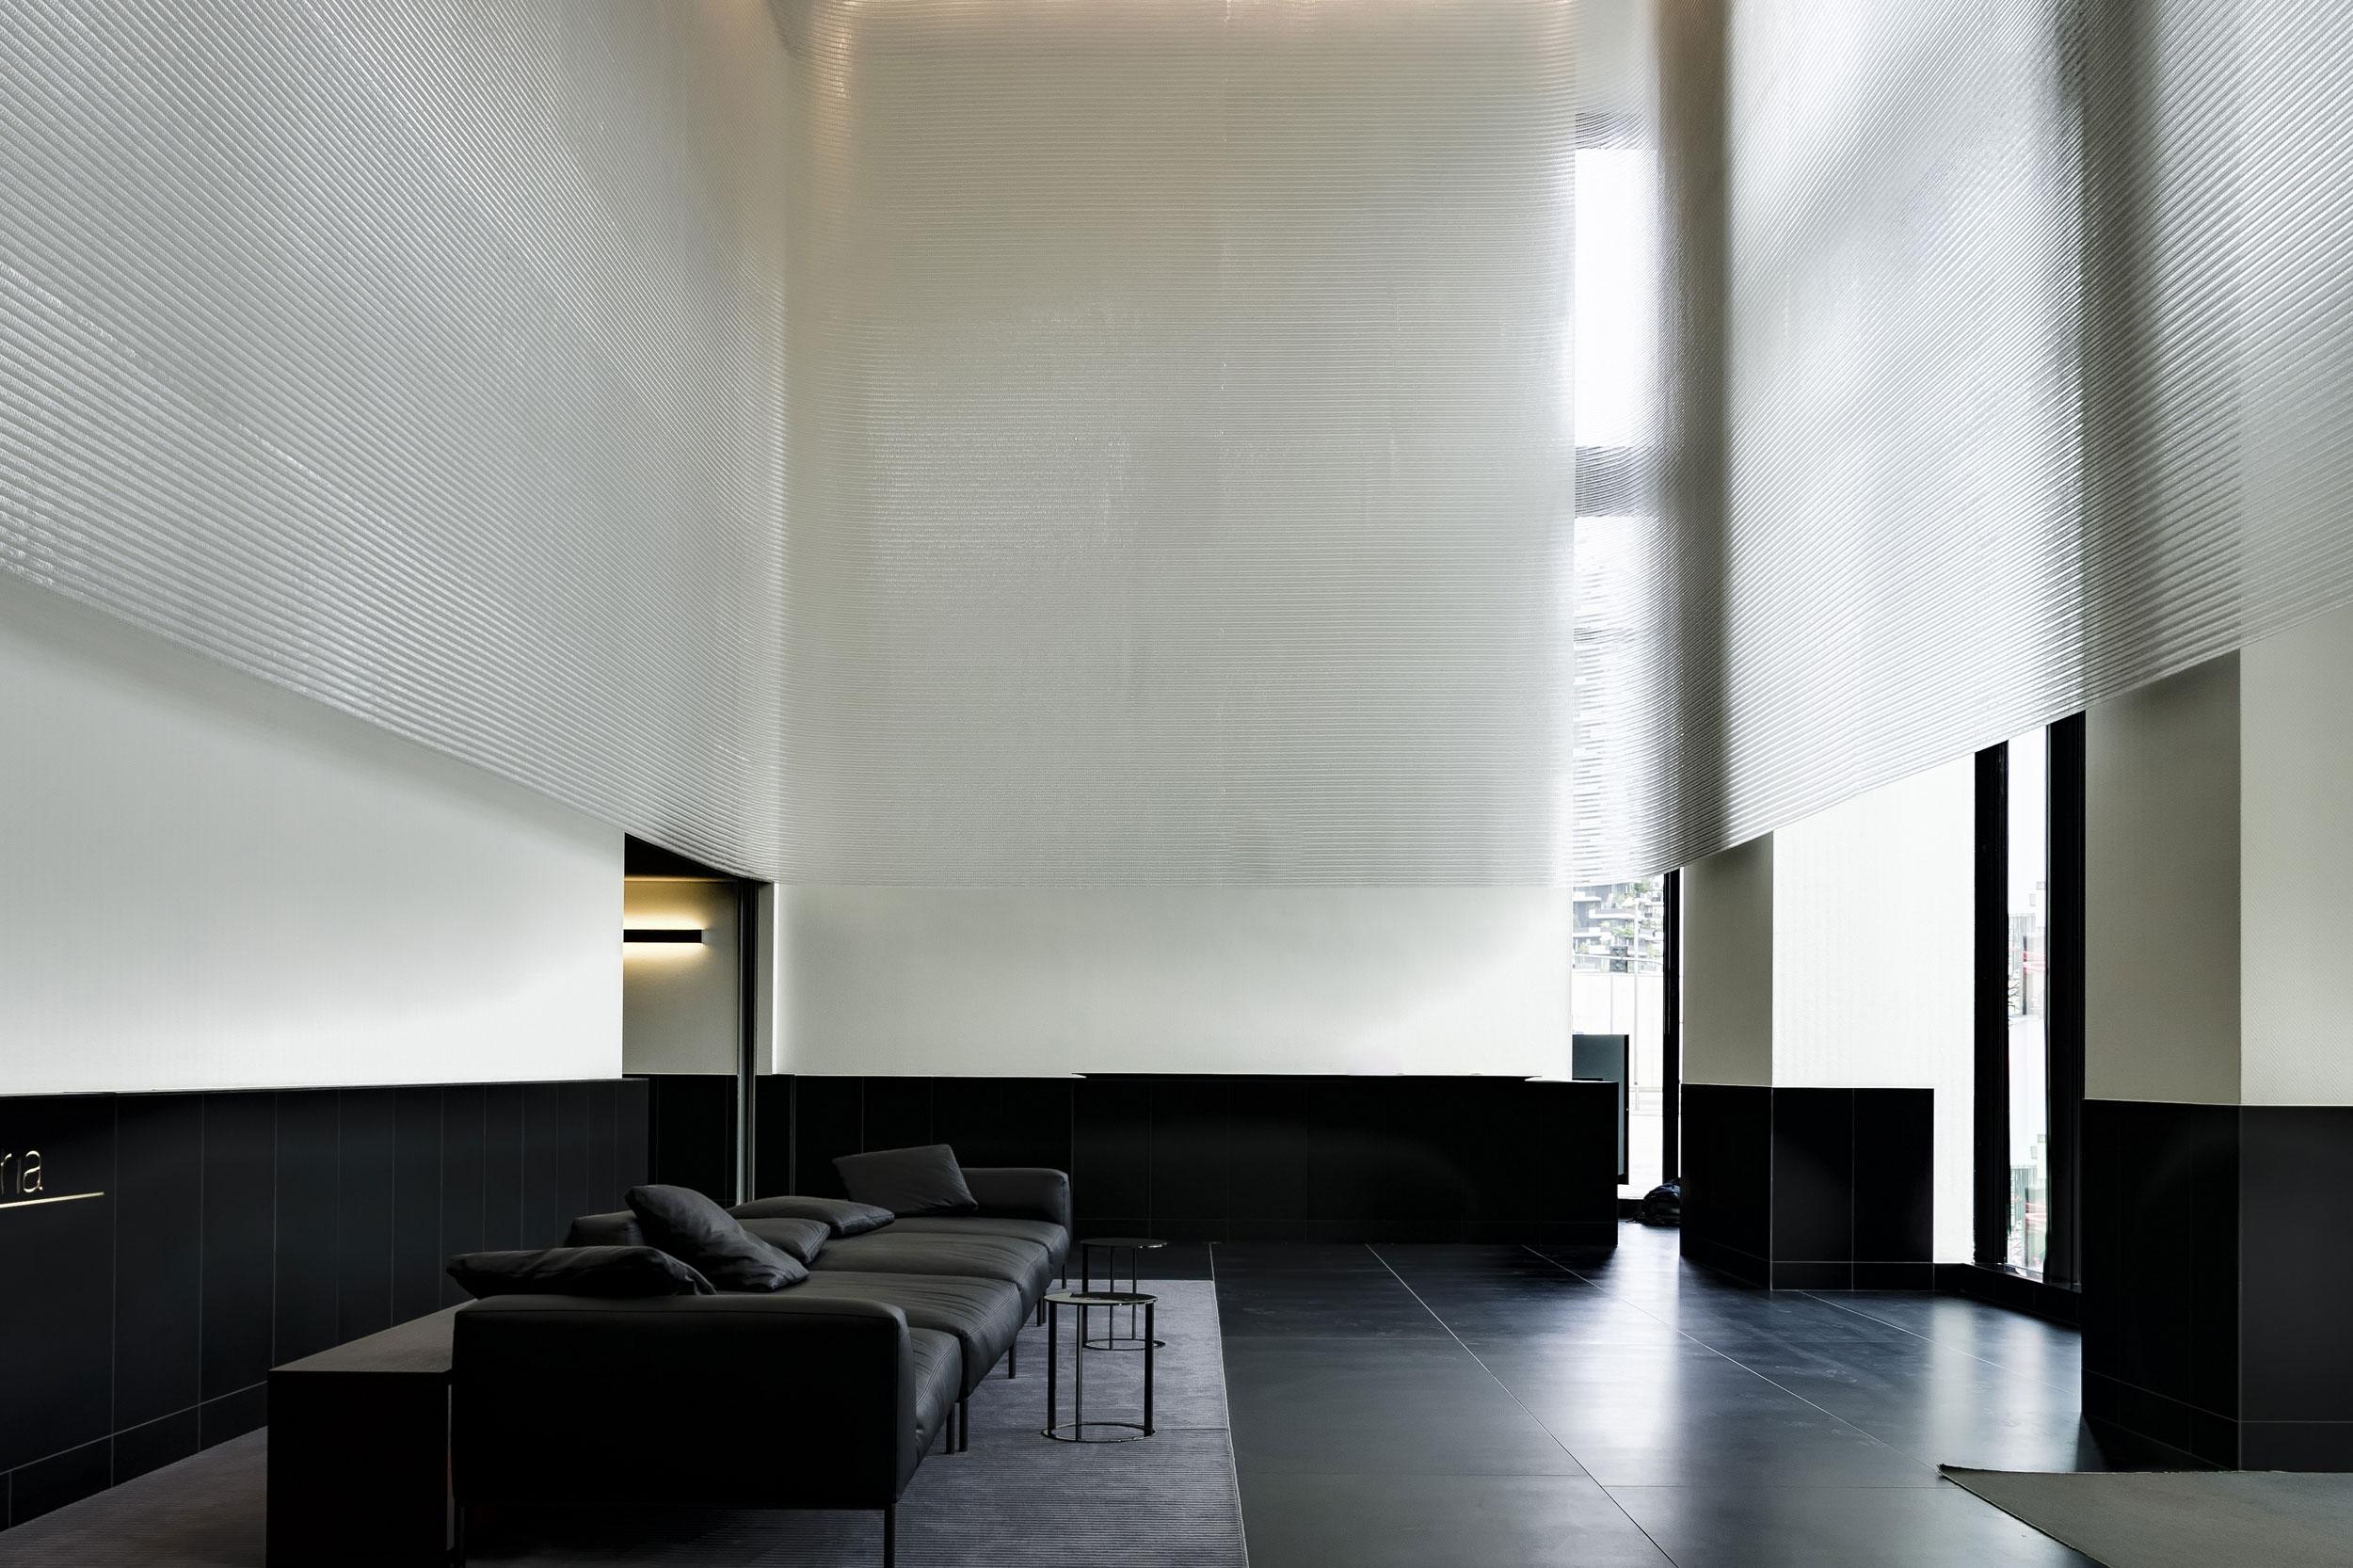 Ethereal Screening for Italian Apartment Foyer  Torre Solaria, Milan, Italy